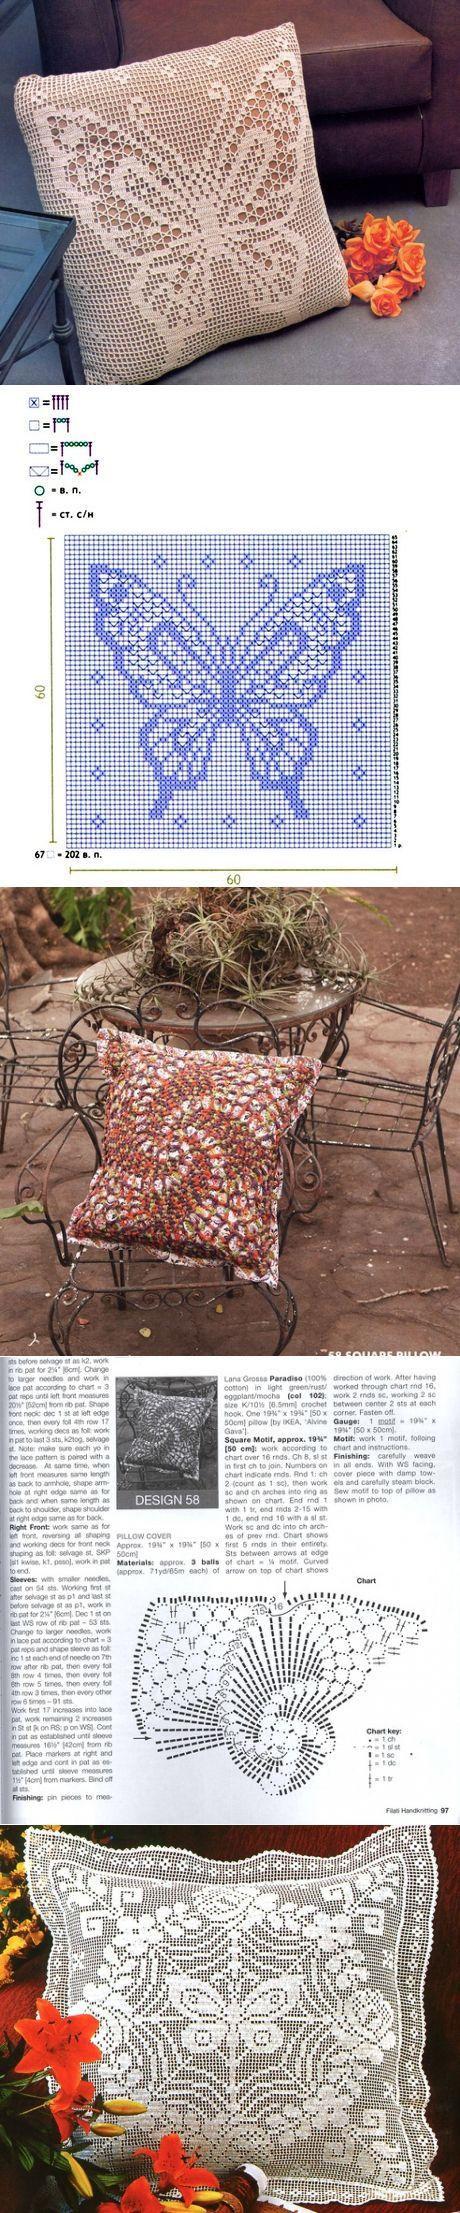 cojin crochet-esquema-patron-otakulandia.es (7)